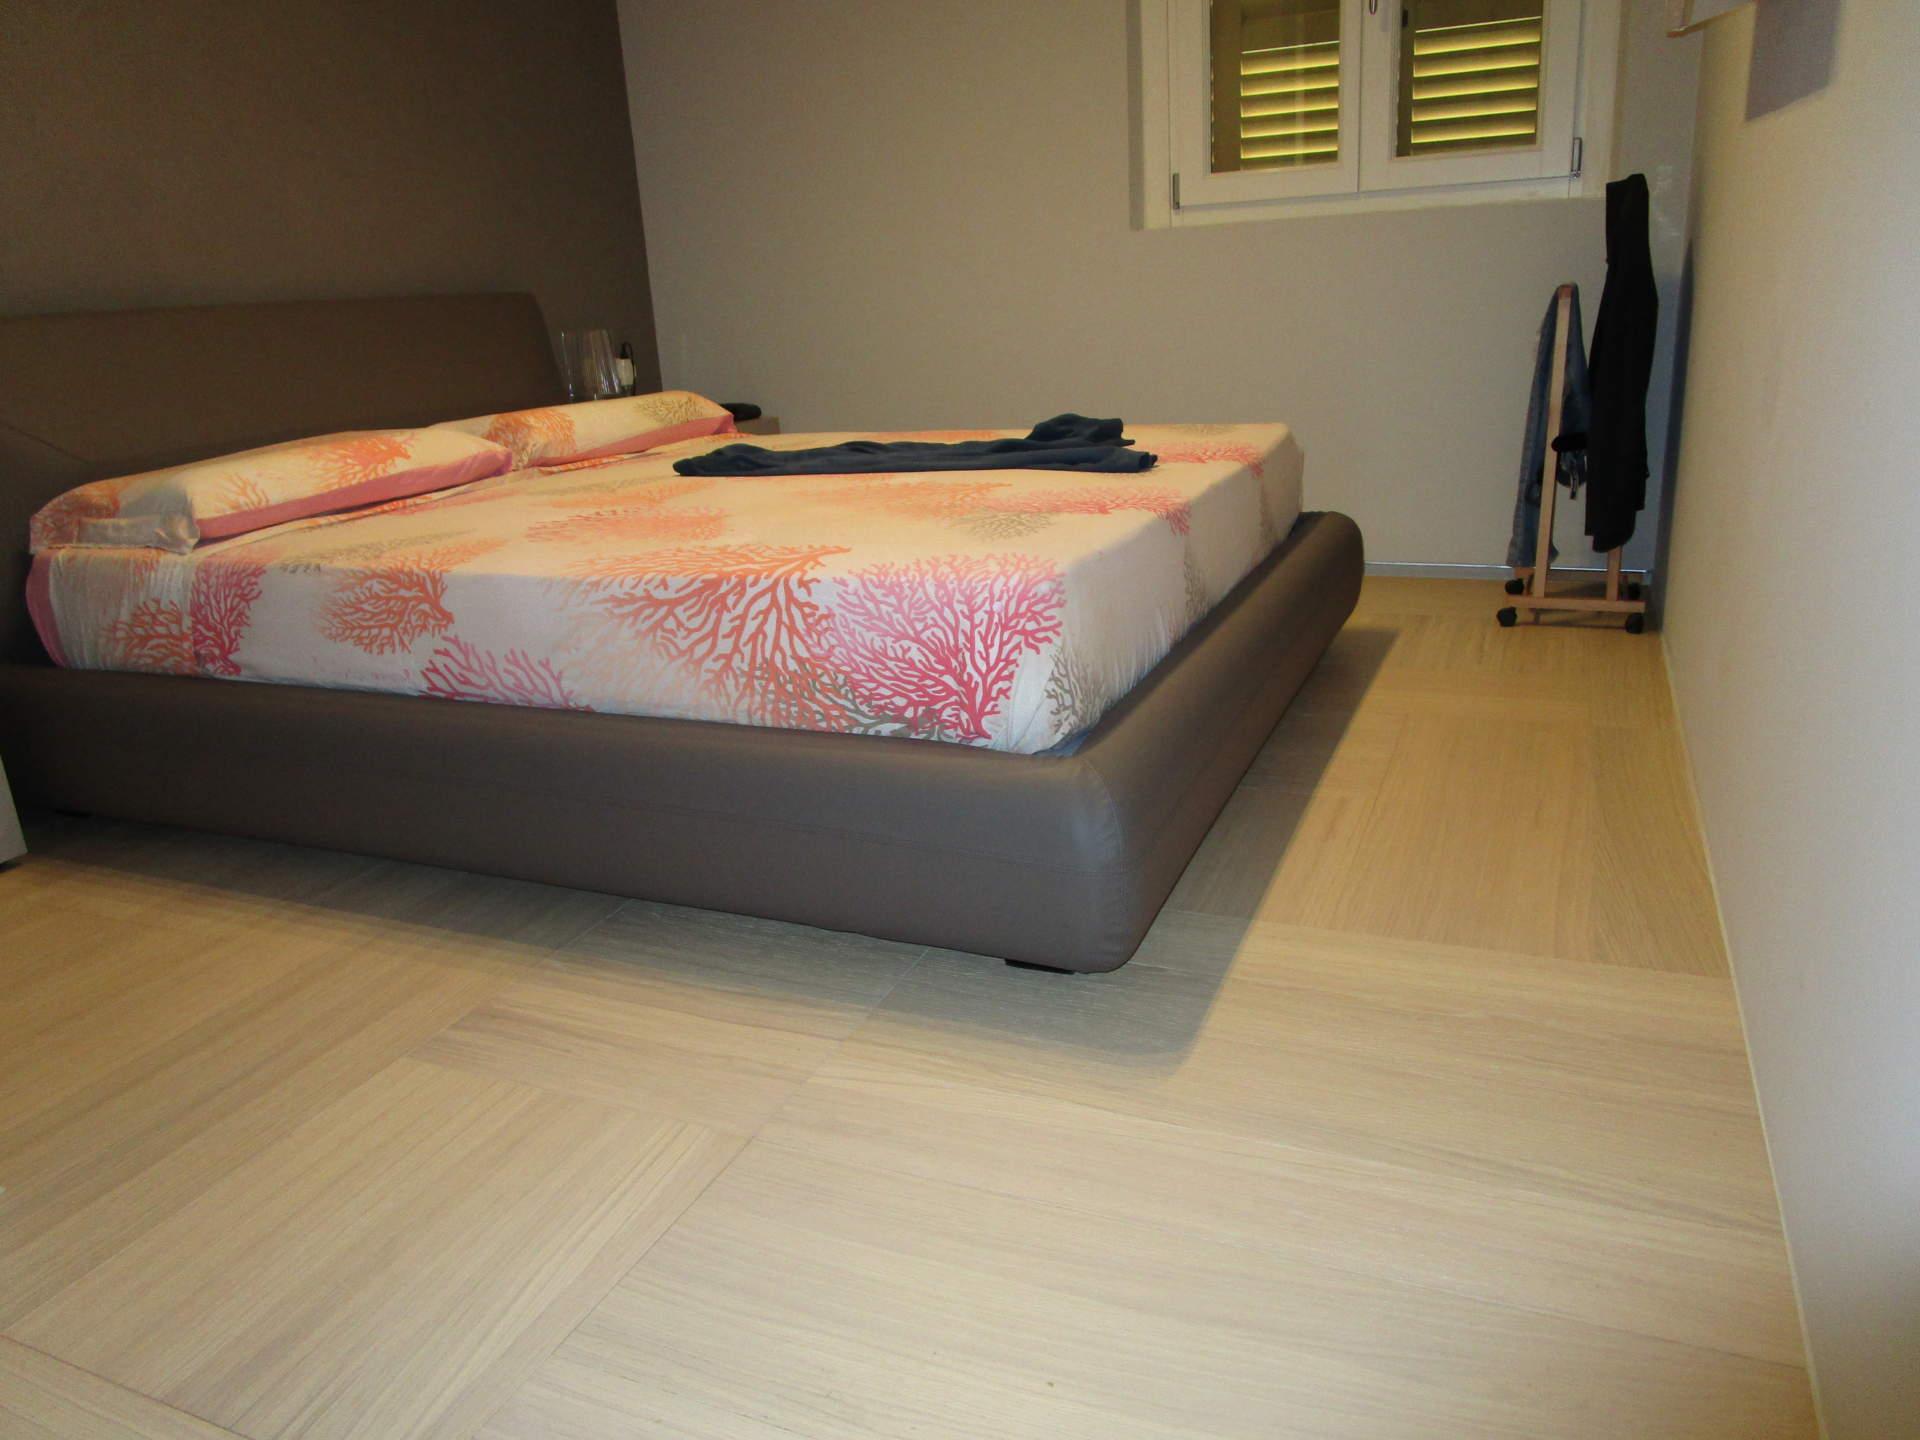 Serie Natural Genius_Foxtrot Rovere Montblanc & Kerakoll Design House